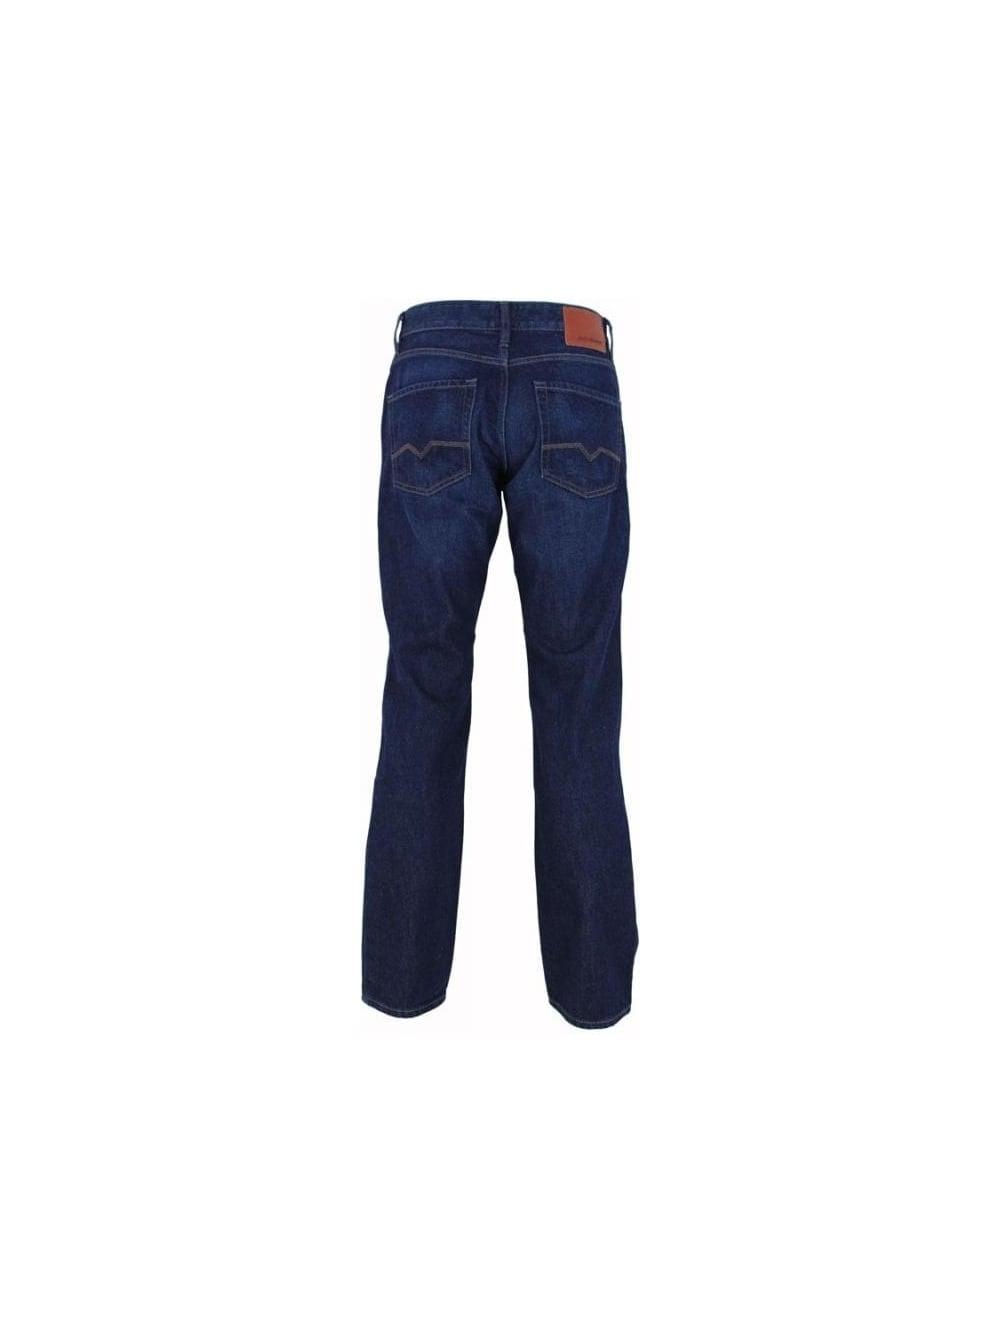 boss orange 25 some reg fit jeans in navy northern threads. Black Bedroom Furniture Sets. Home Design Ideas